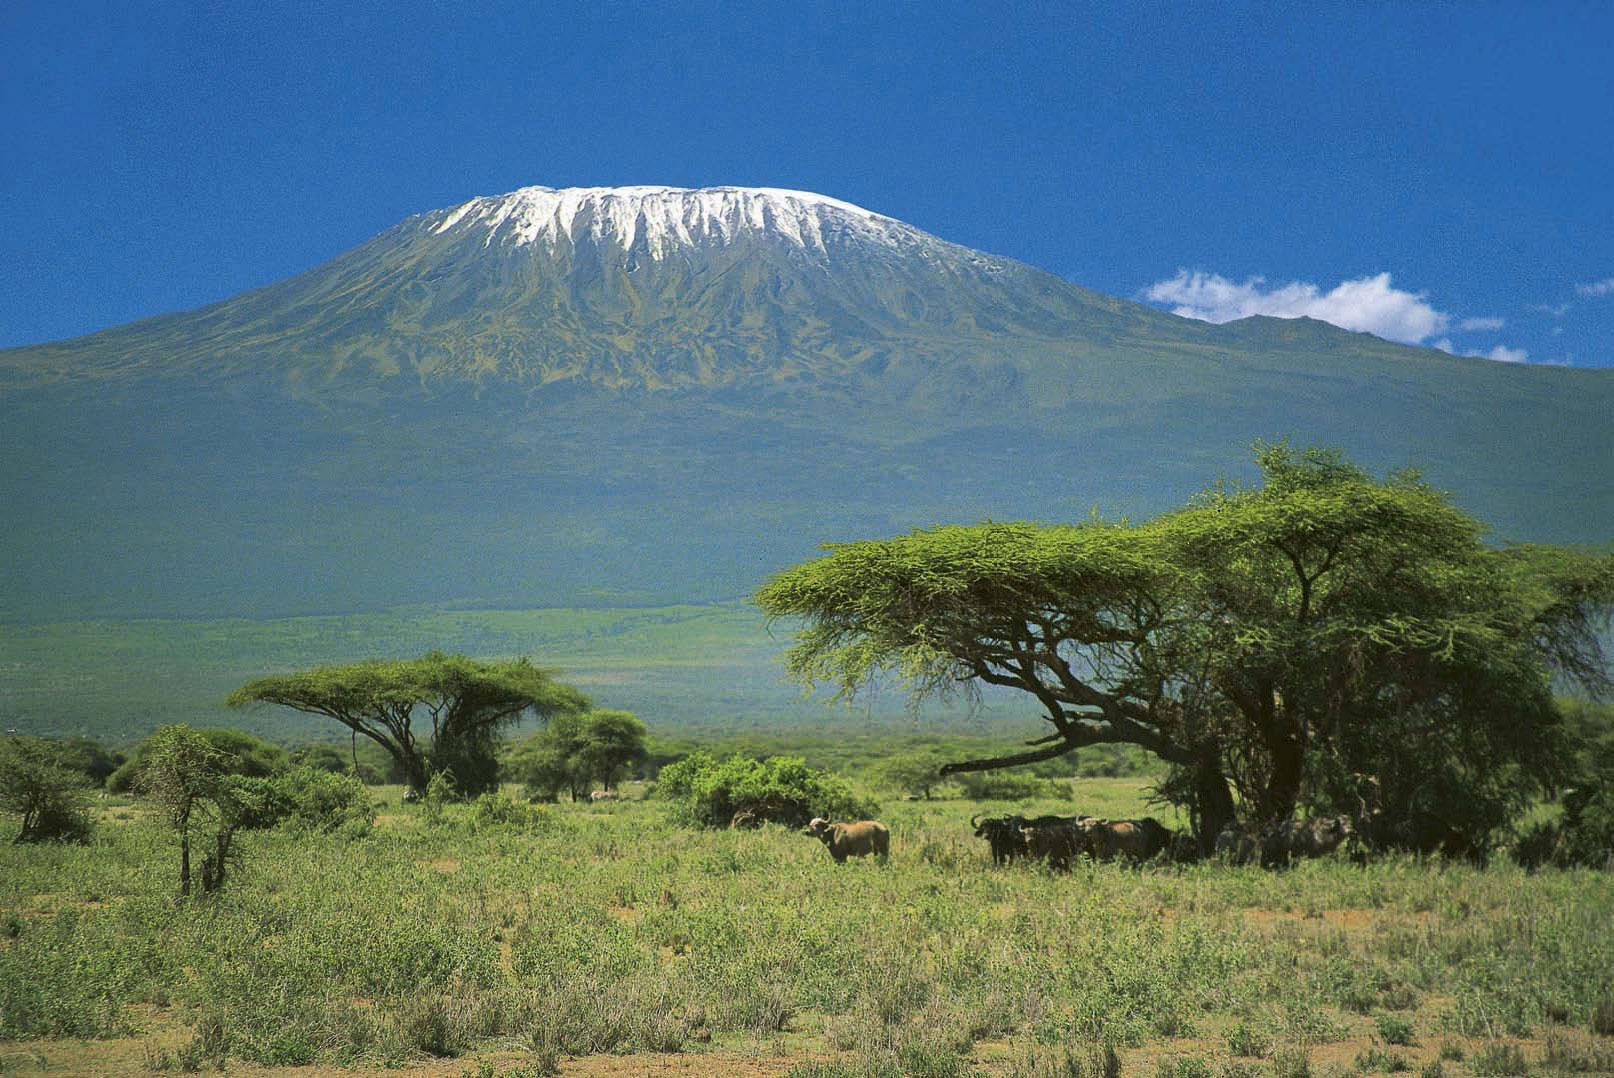 Trekkinggipfel: Der Kilimanjaro